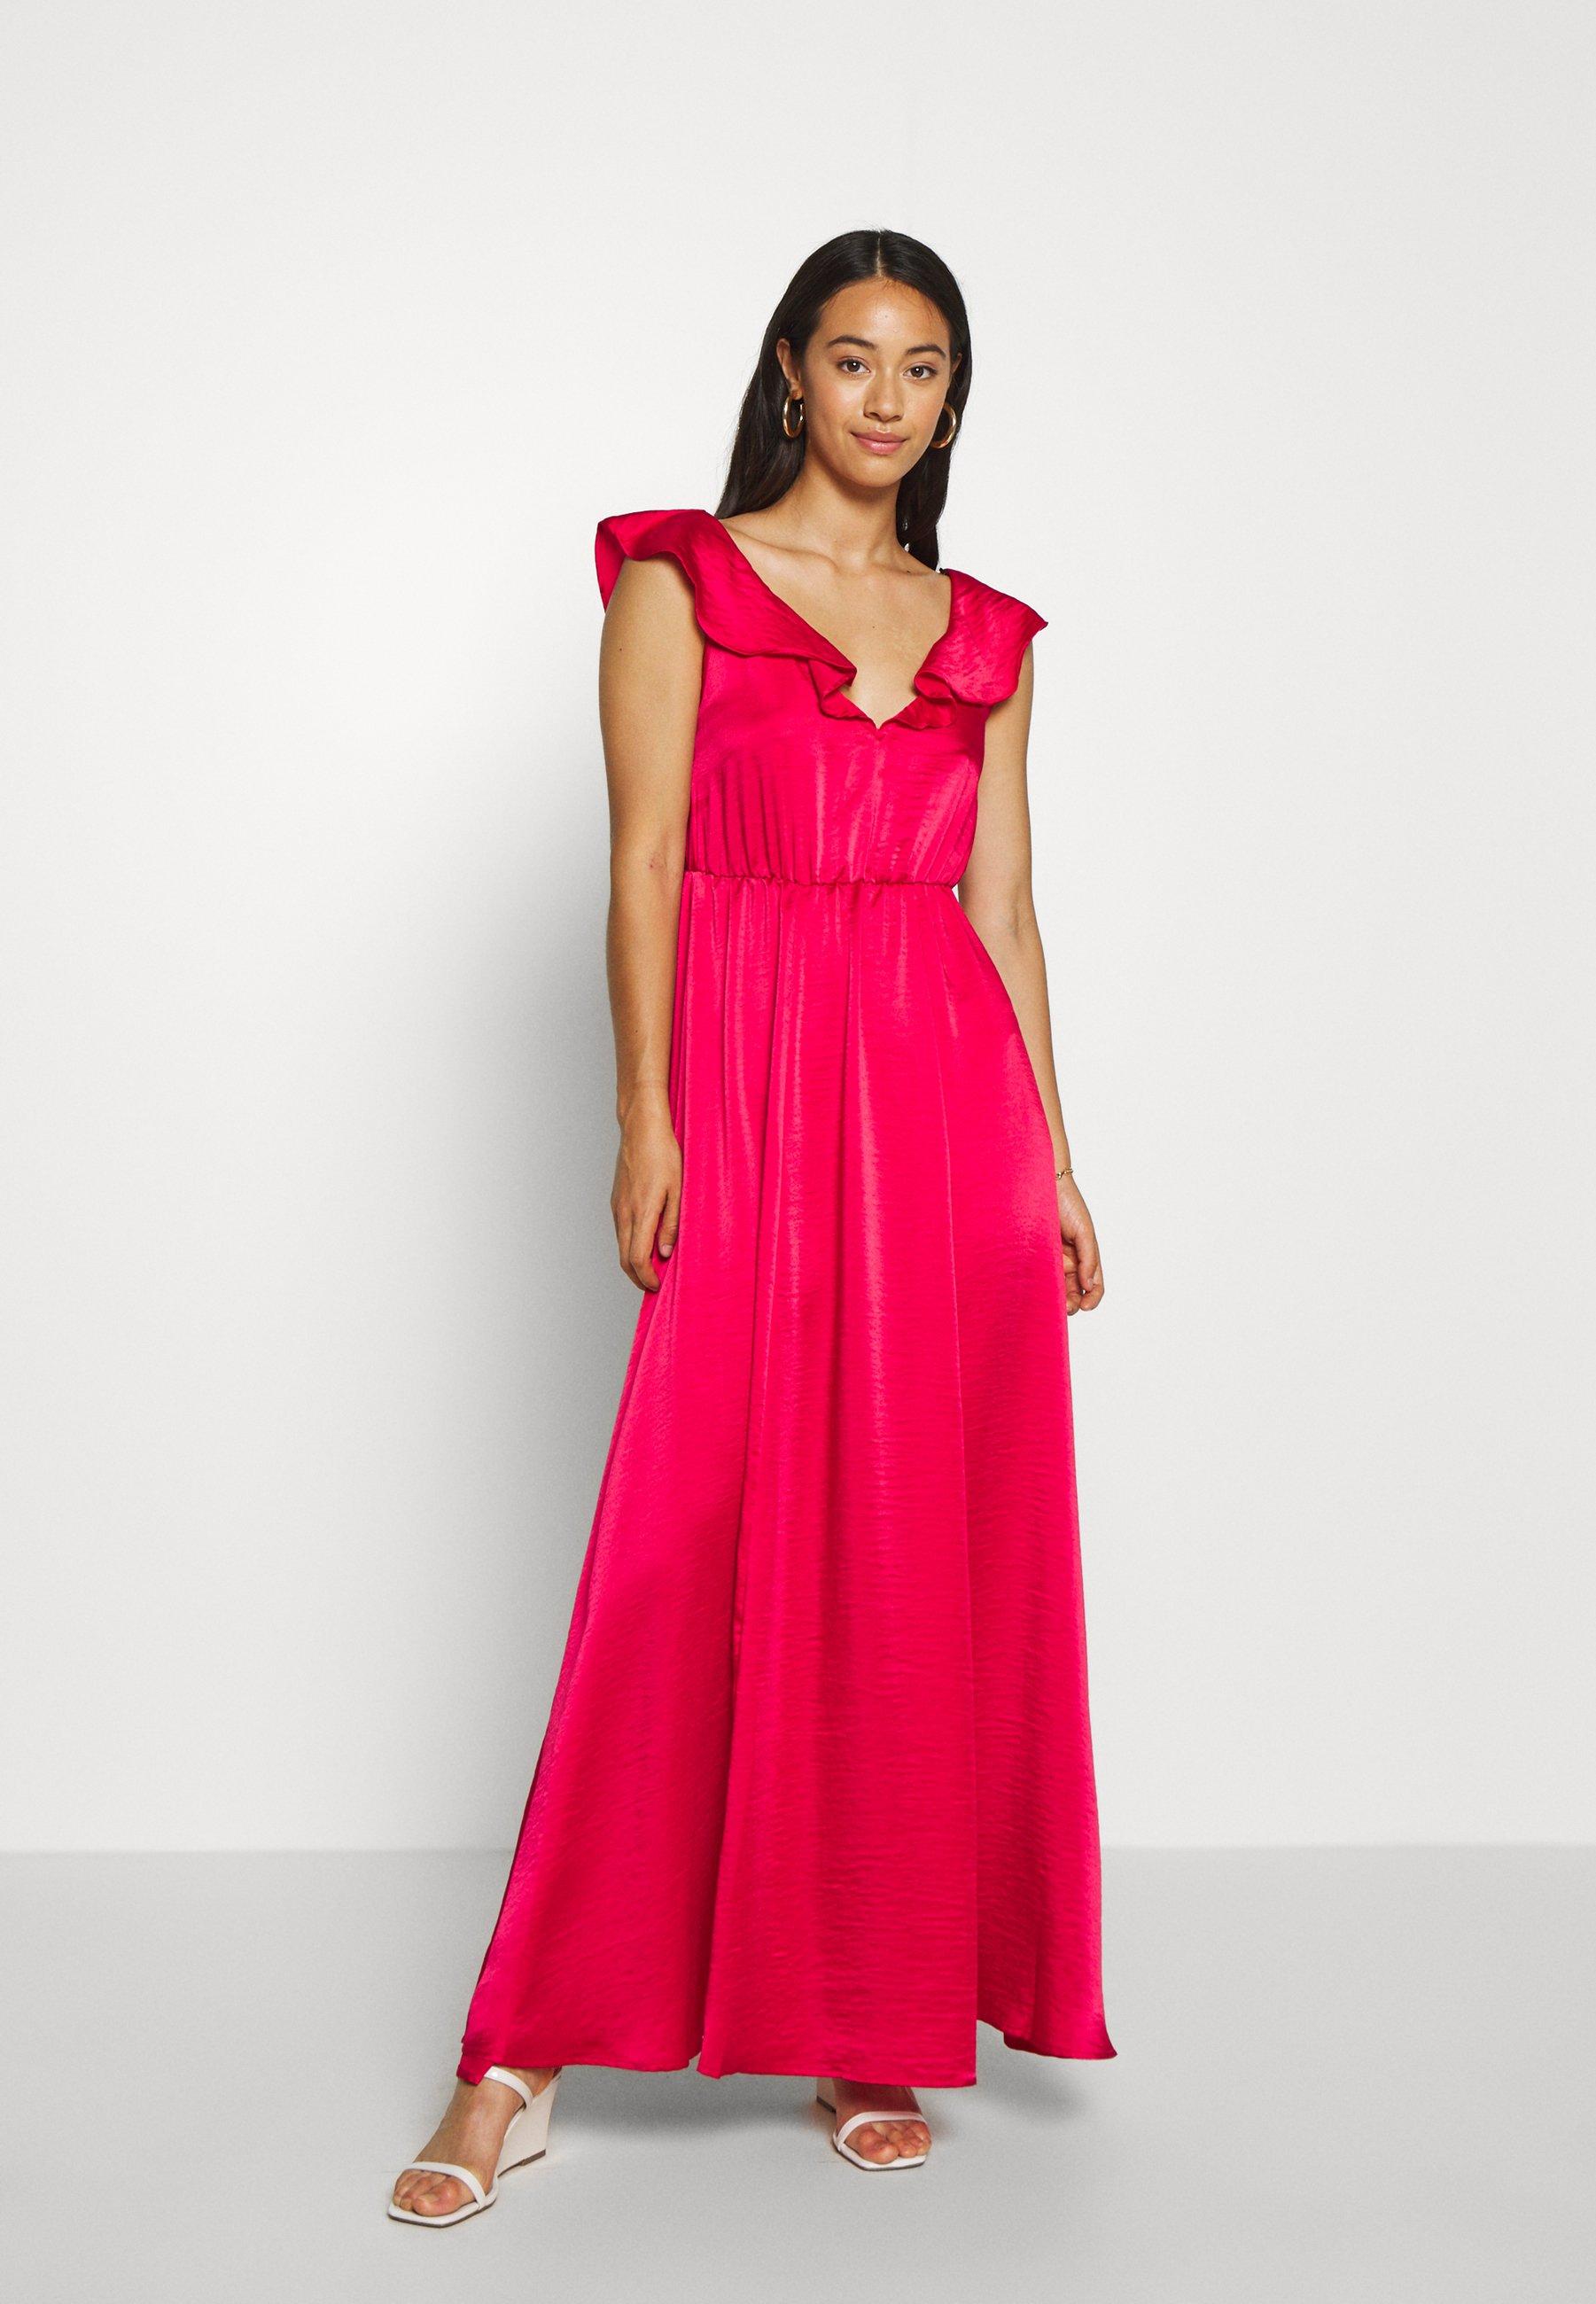 VIFLOATING FRILL MAXI DRESS   Ballkleid   barberry